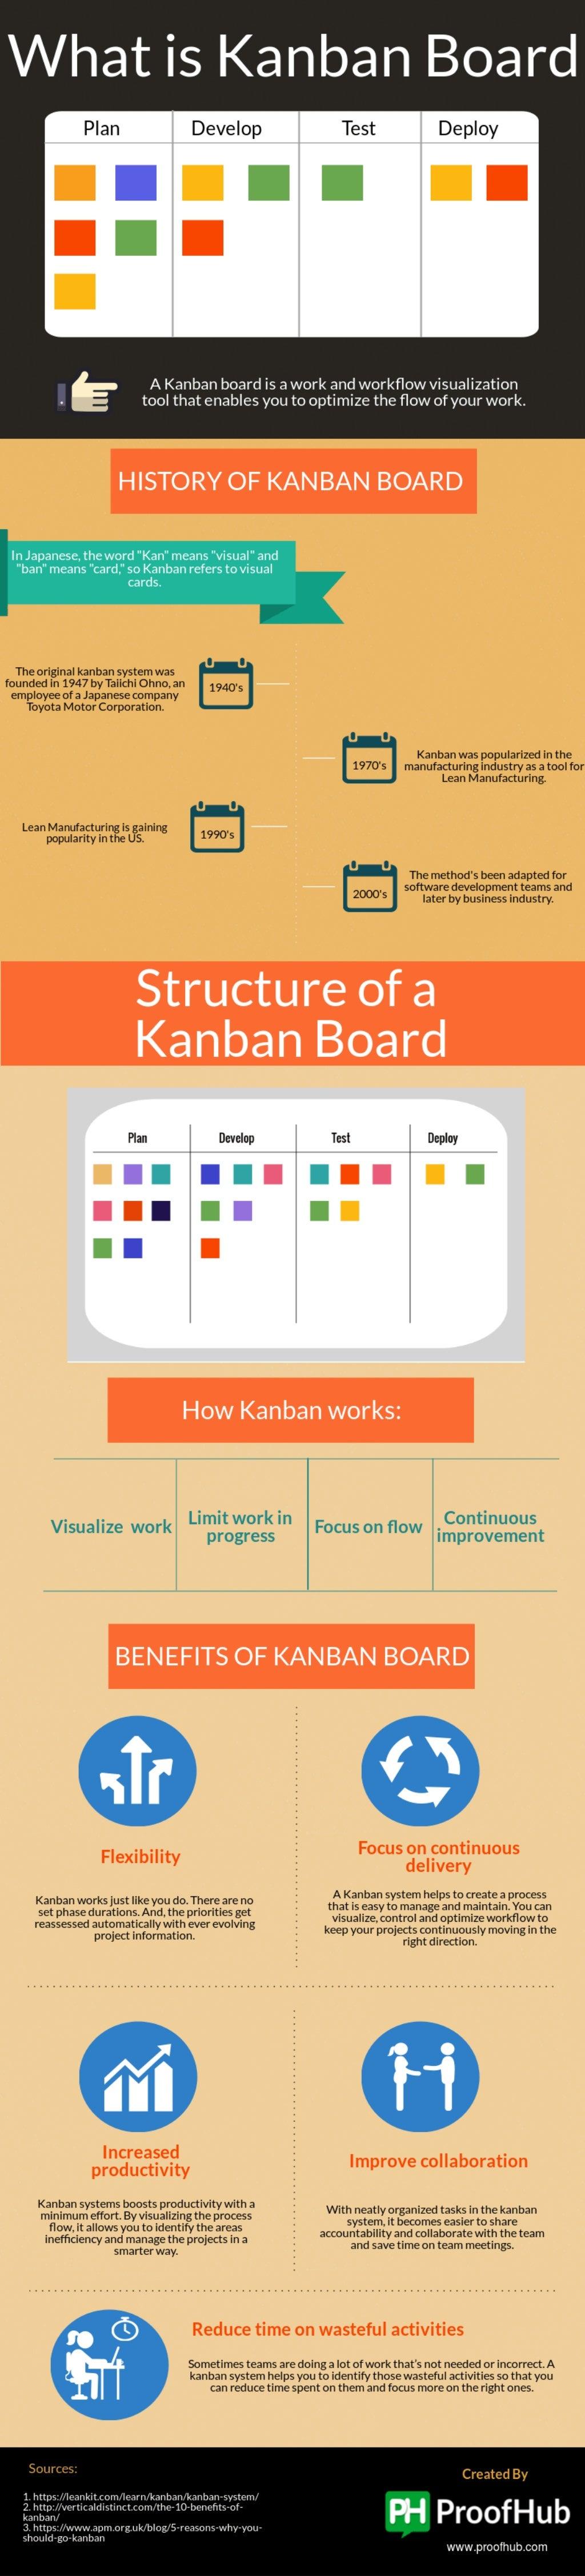 Kanban - Magazine cover